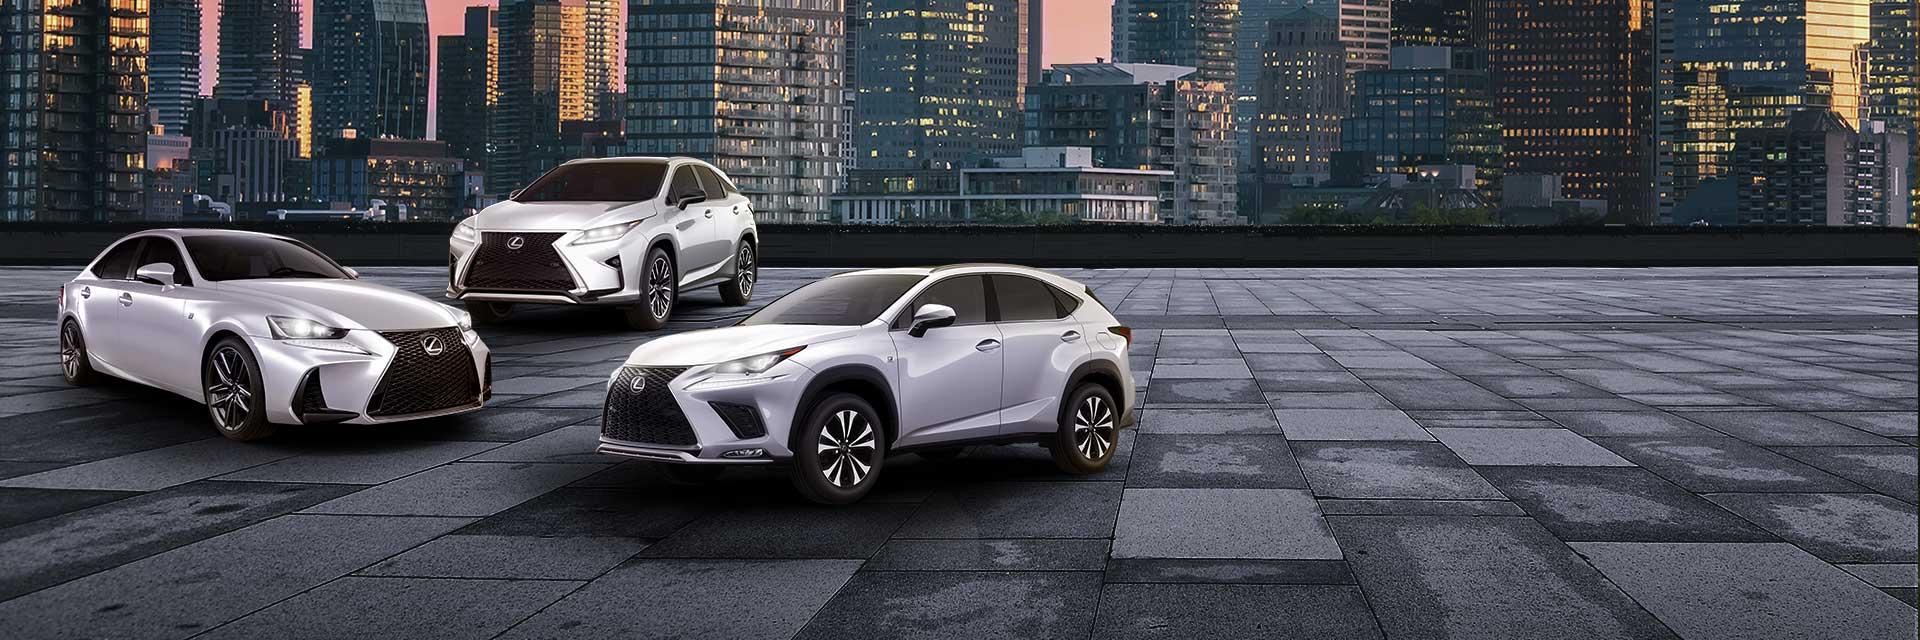 Toronto Area Lexus Dealers Current Offers - Lexus dealership toronto